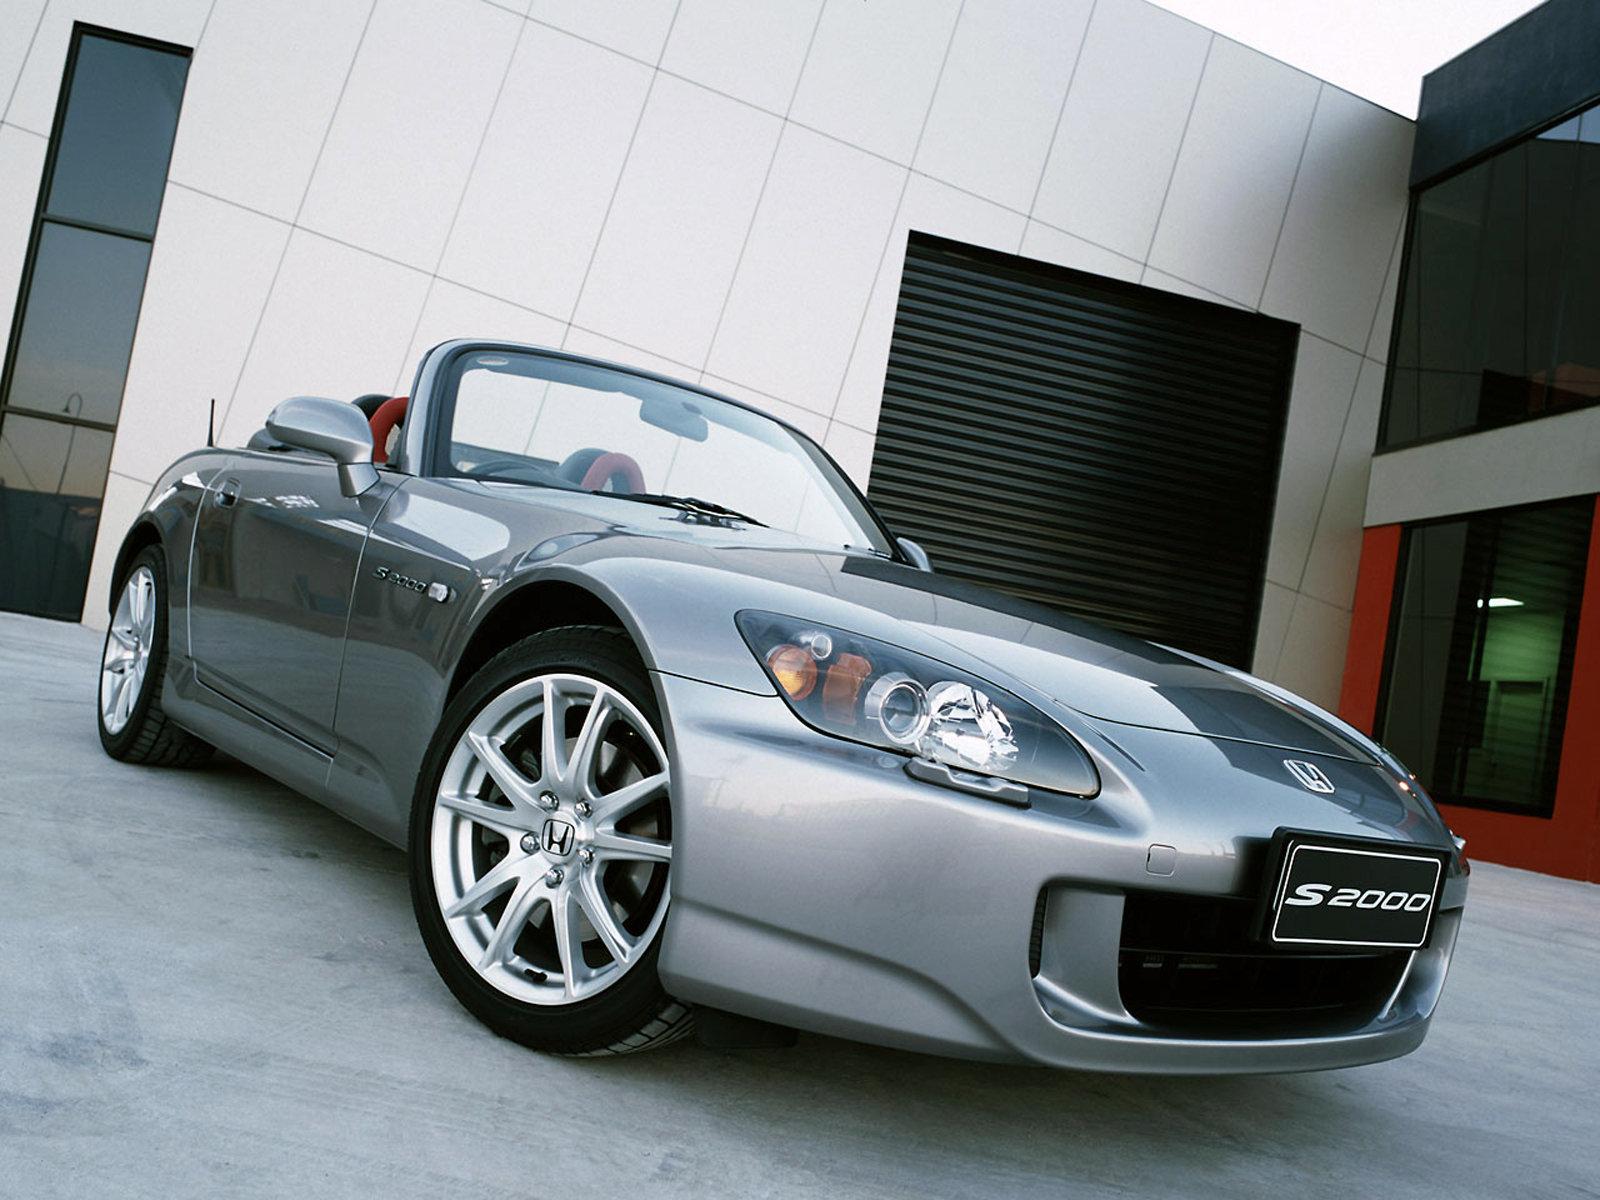 Honda (Хонда) S2000 2004-2009 г.